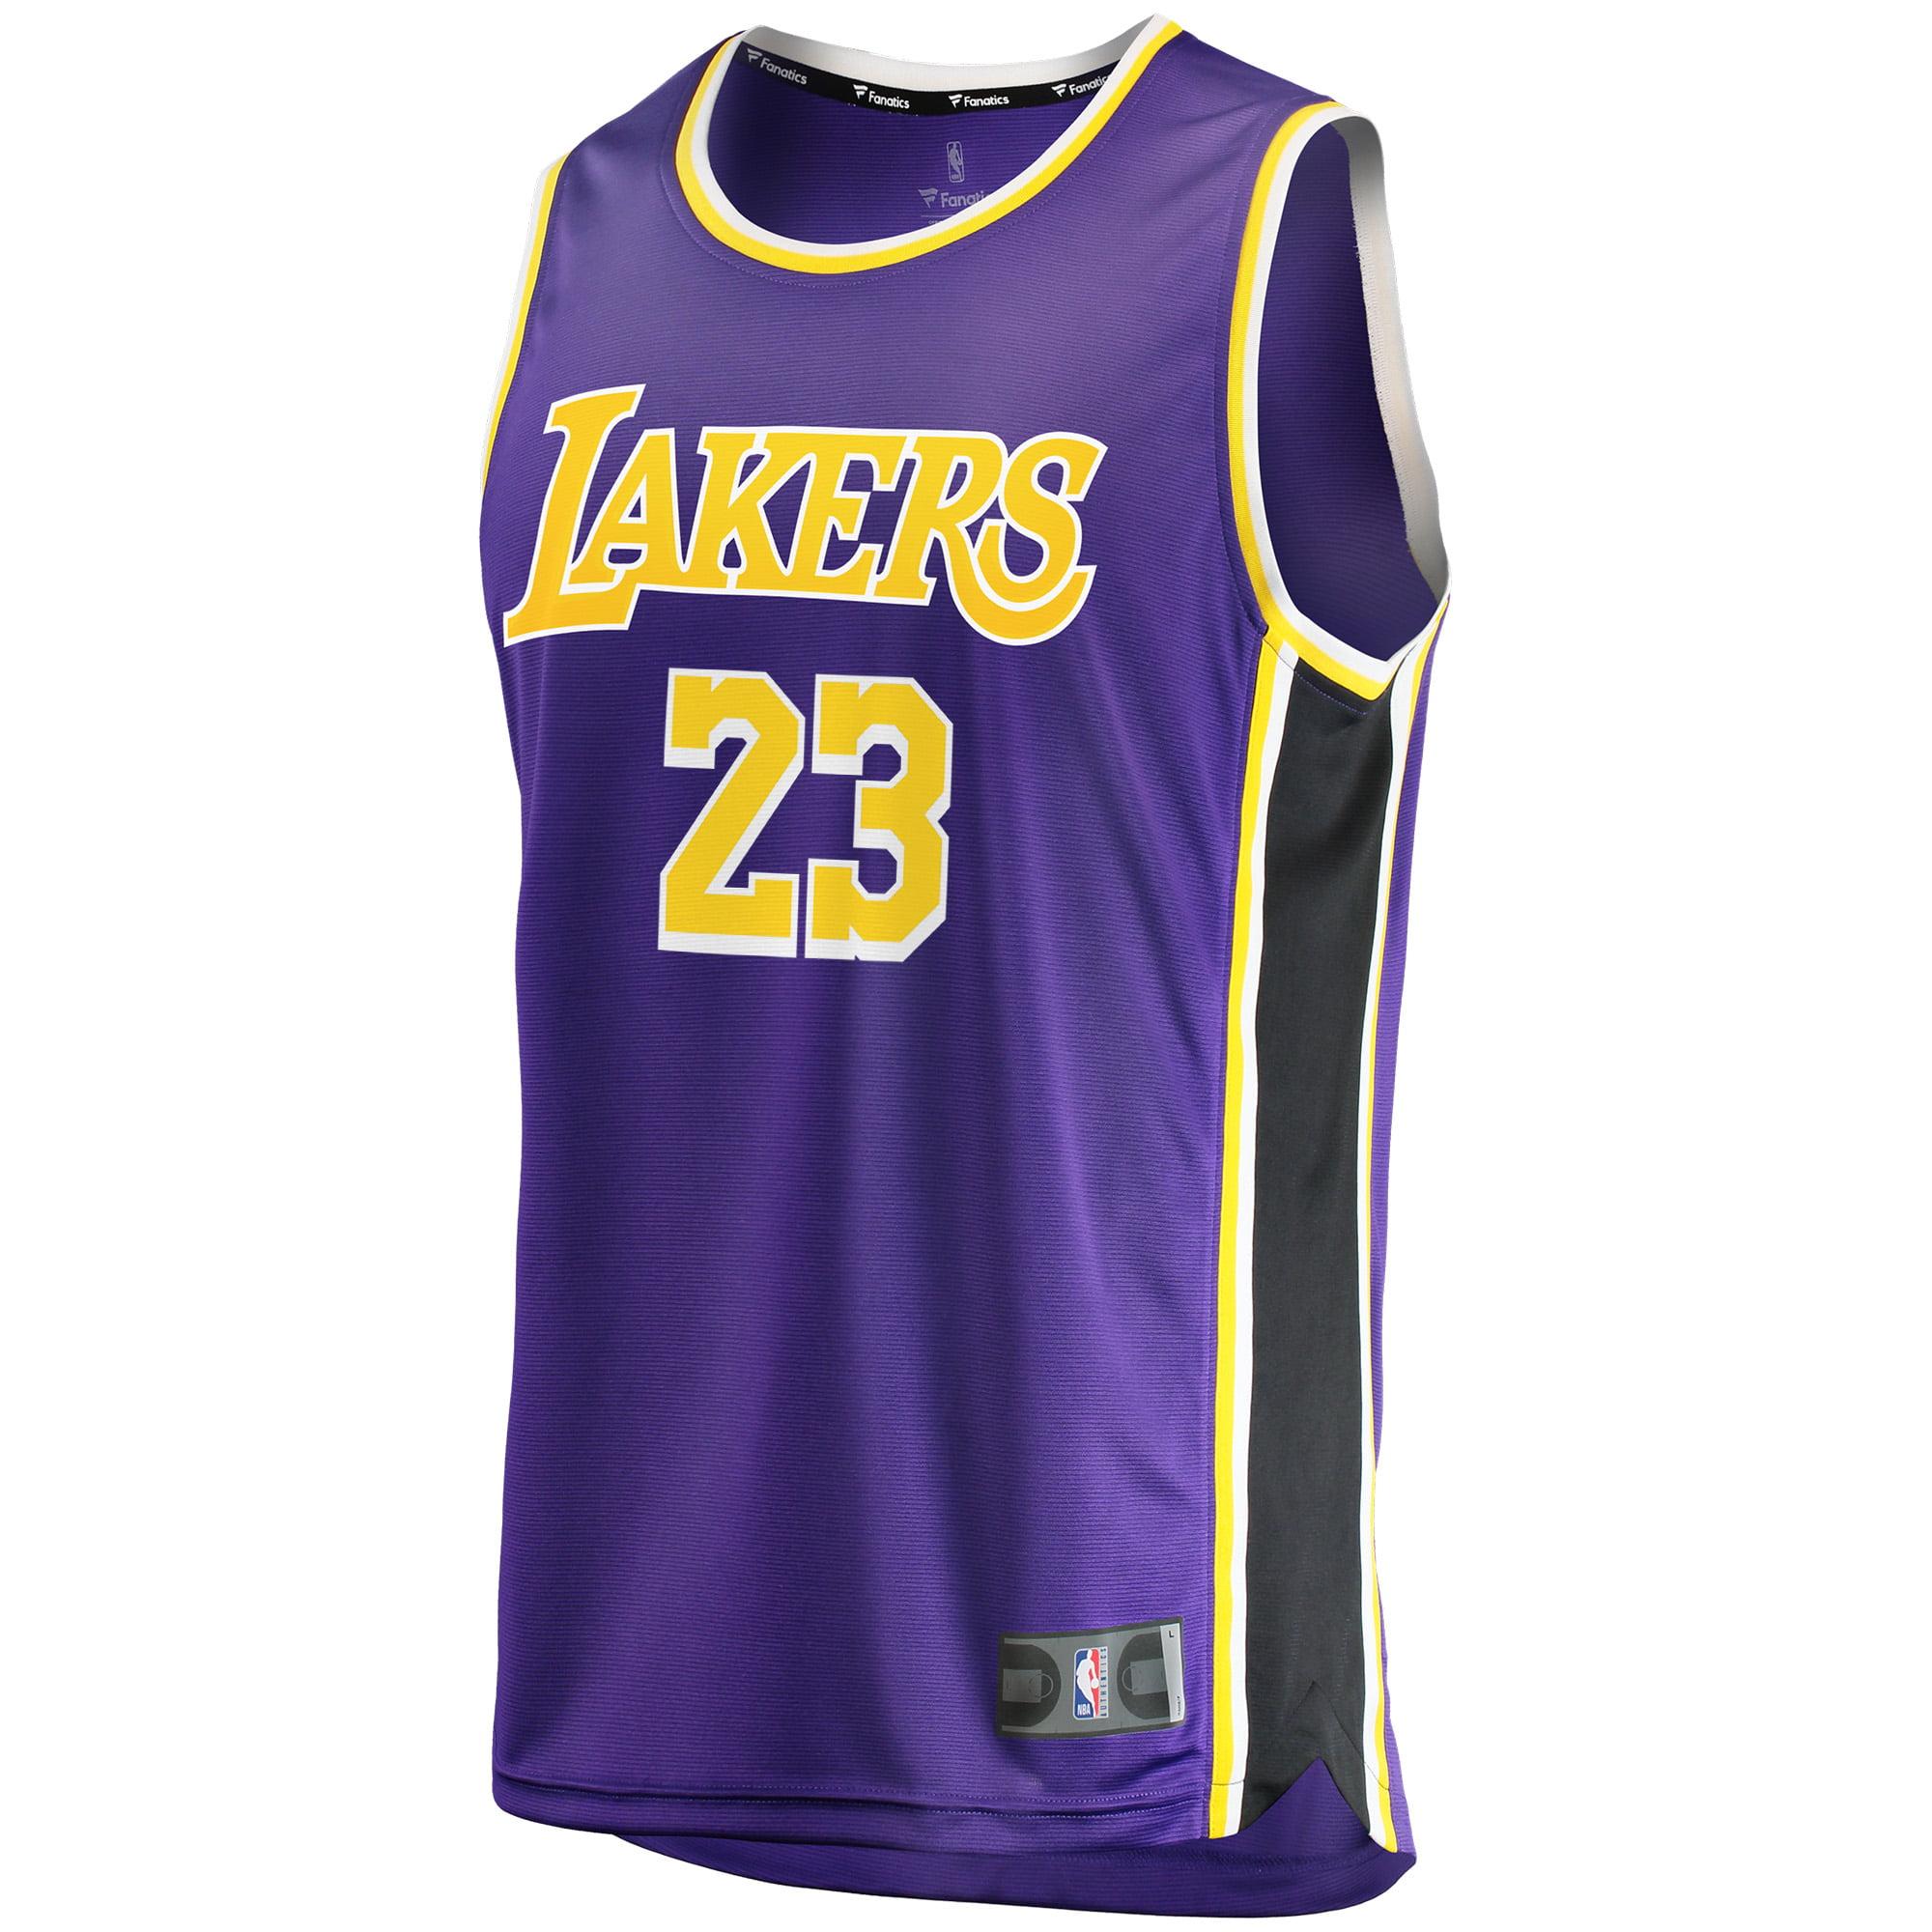 bafccd8c8 LeBron James Los Angeles Lakers Fanatics Branded Youth 2018 19 Fast Break  Replica Jersey Purple - Statement Edition - Walmart.com